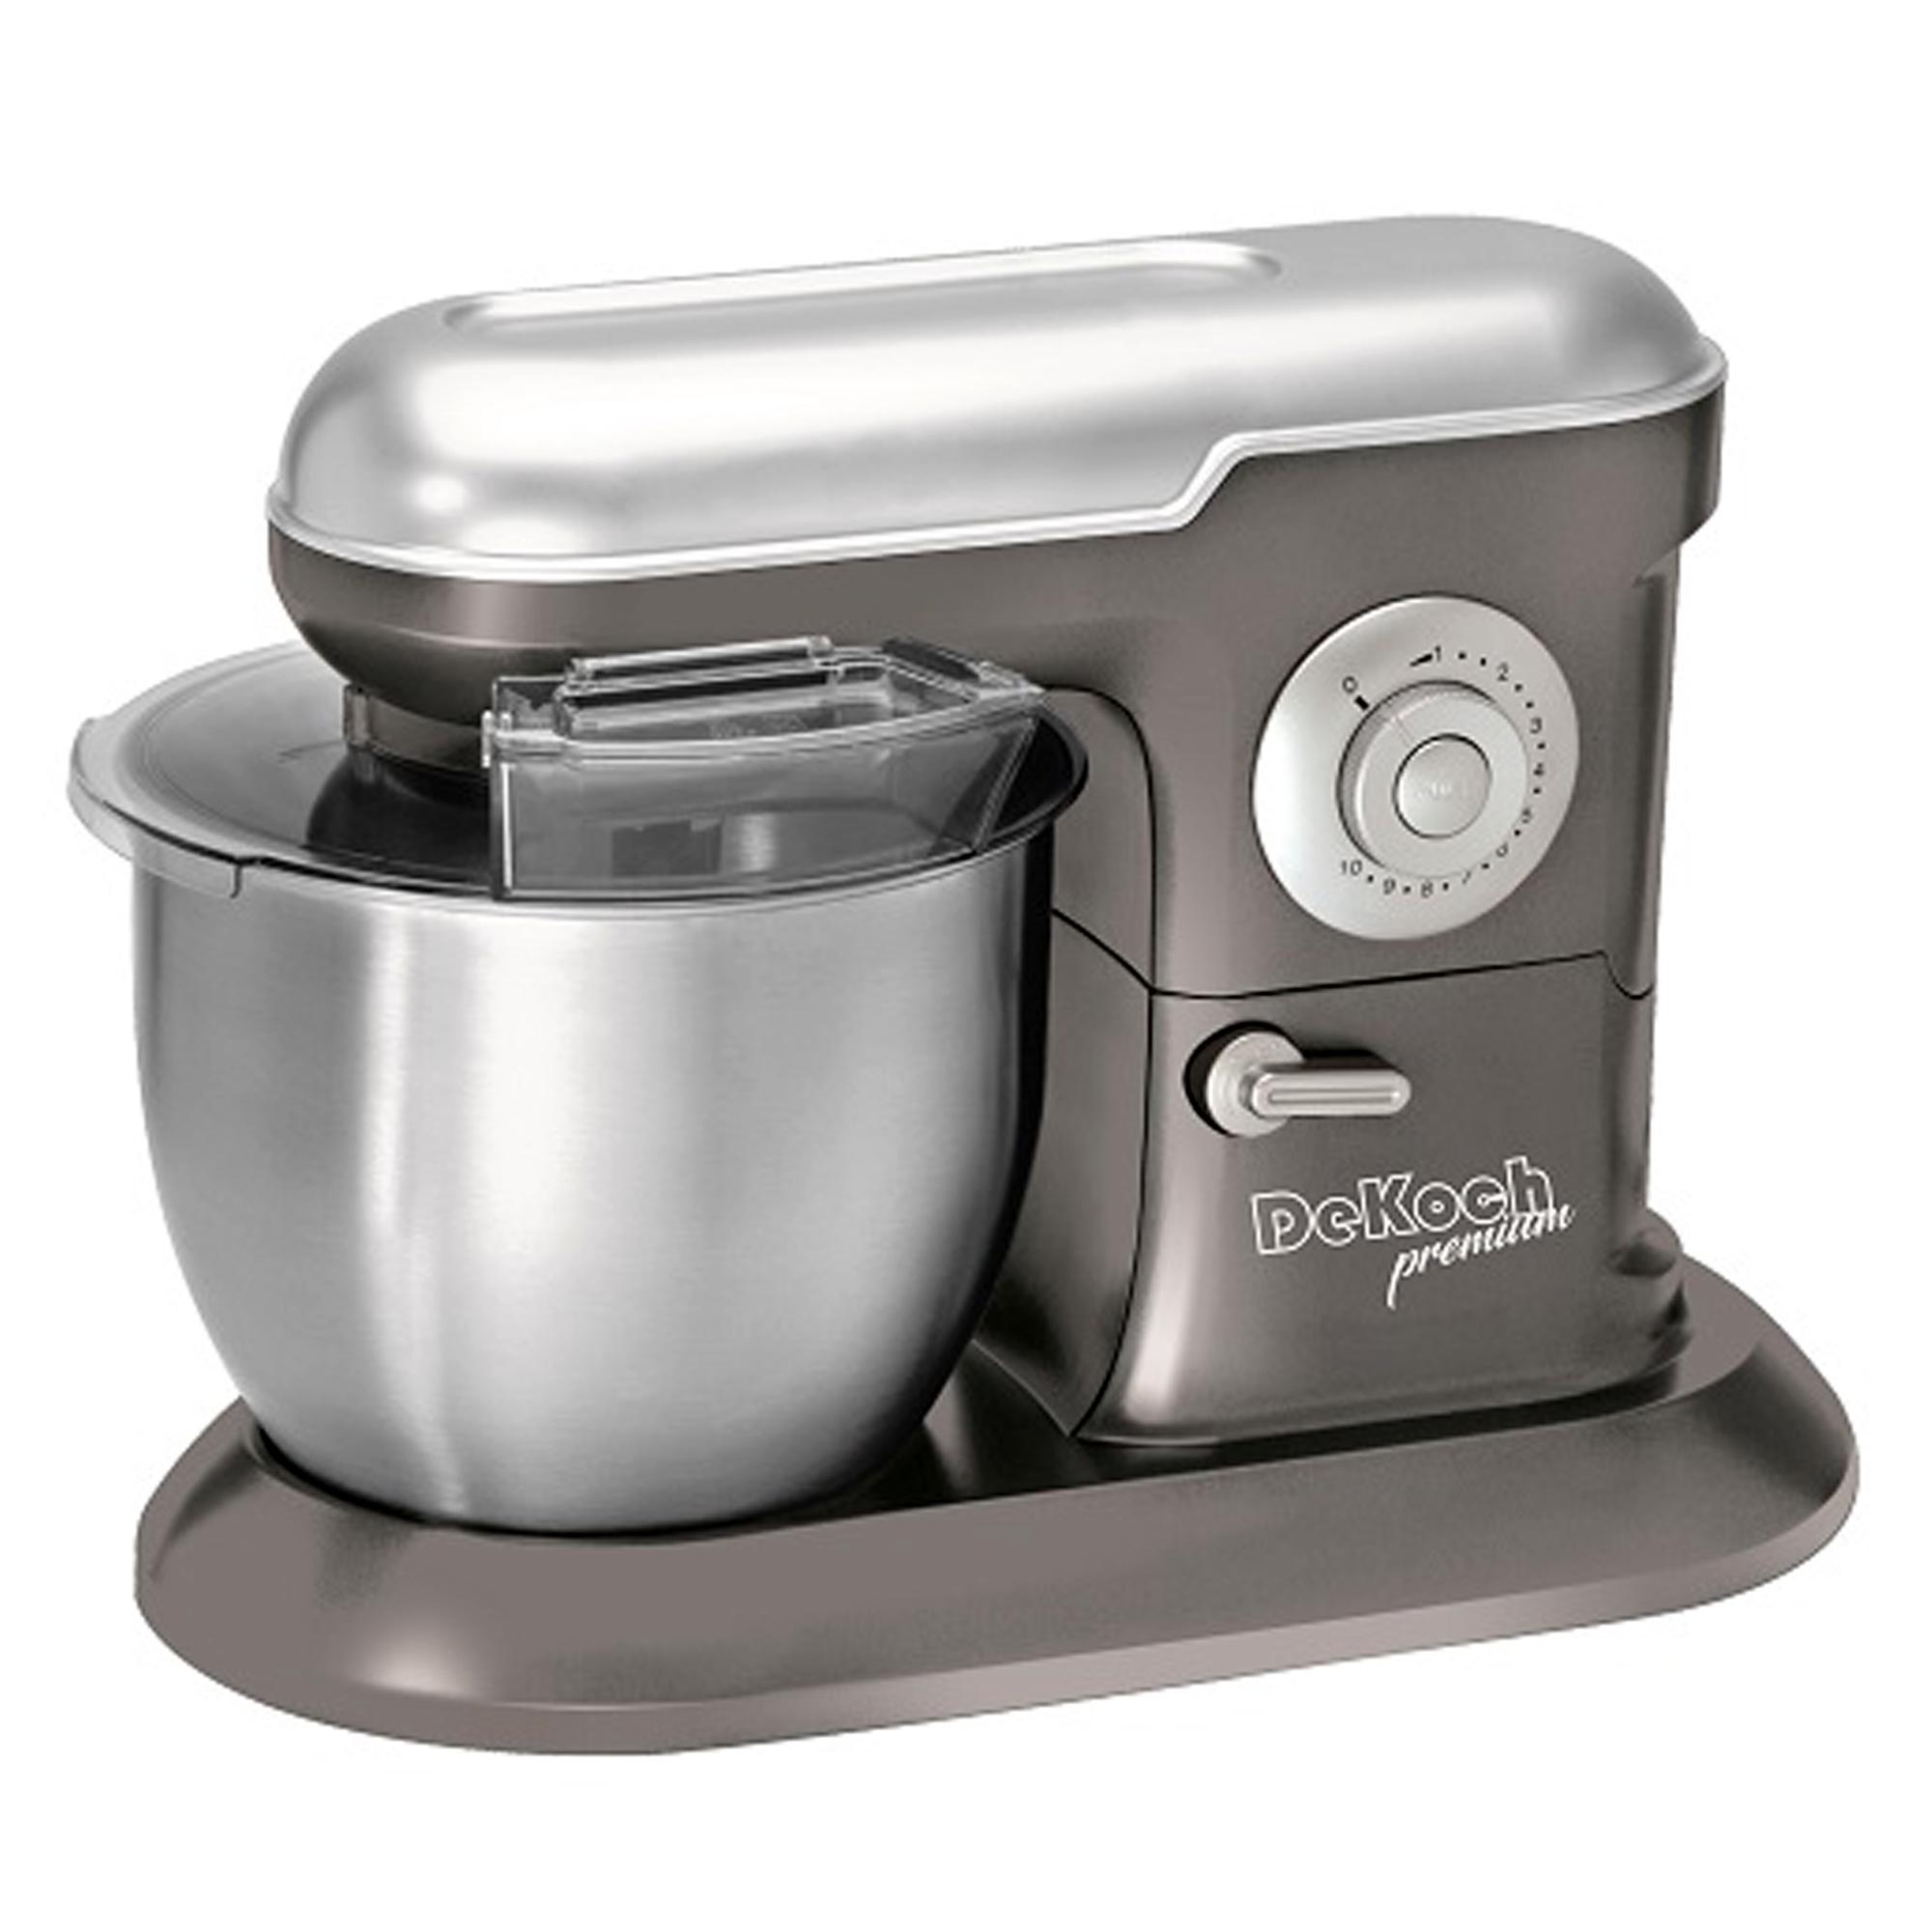 De Koch DK-KM650: Machine de Cuisine Argent